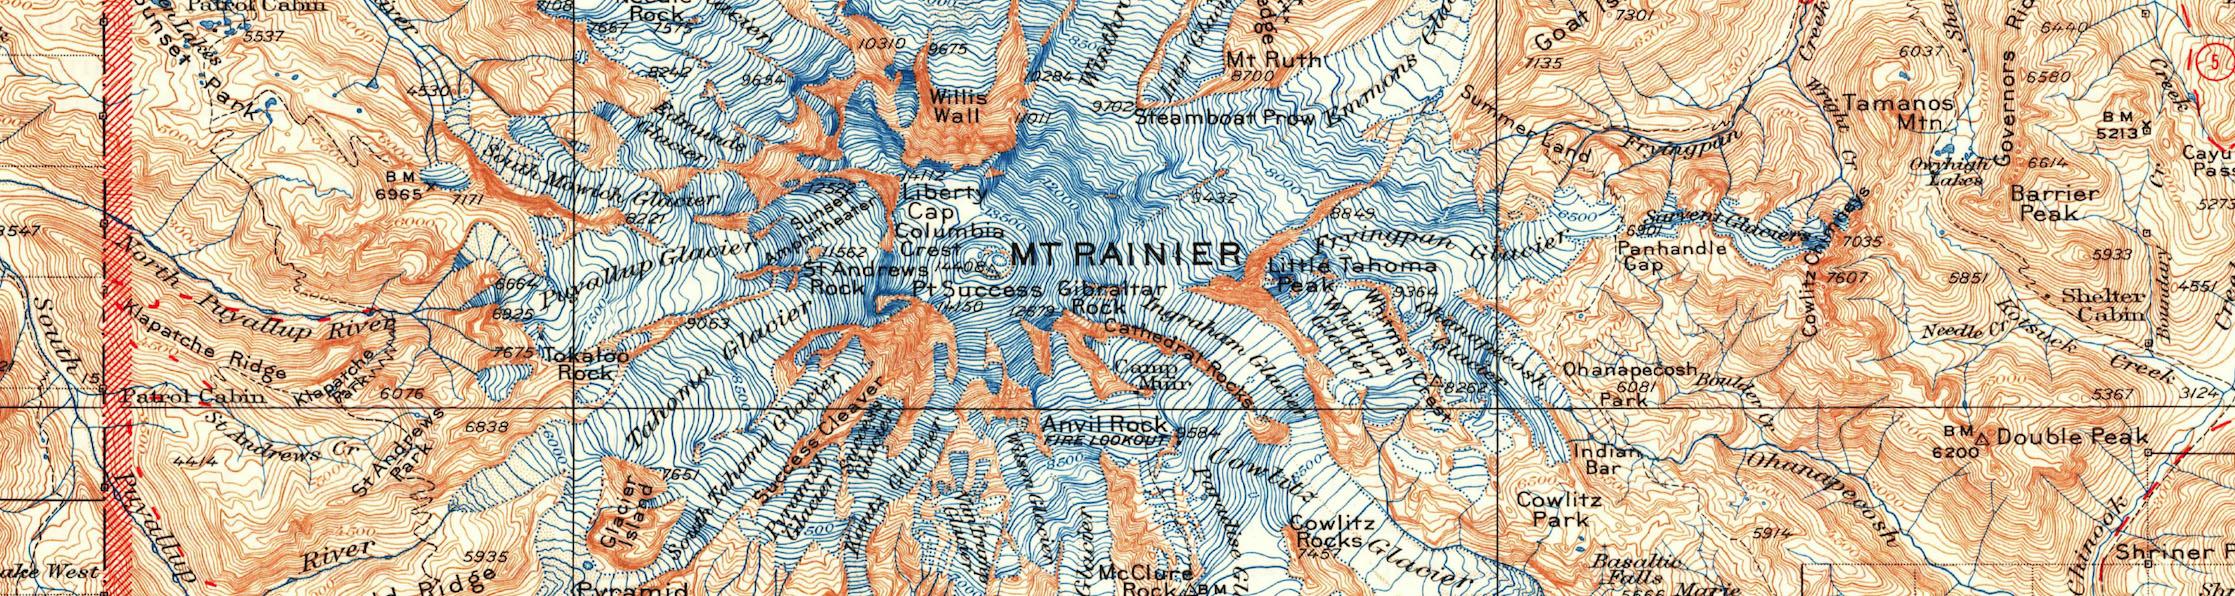 Mount Rainier National Park 1928 USGS Topographical Map